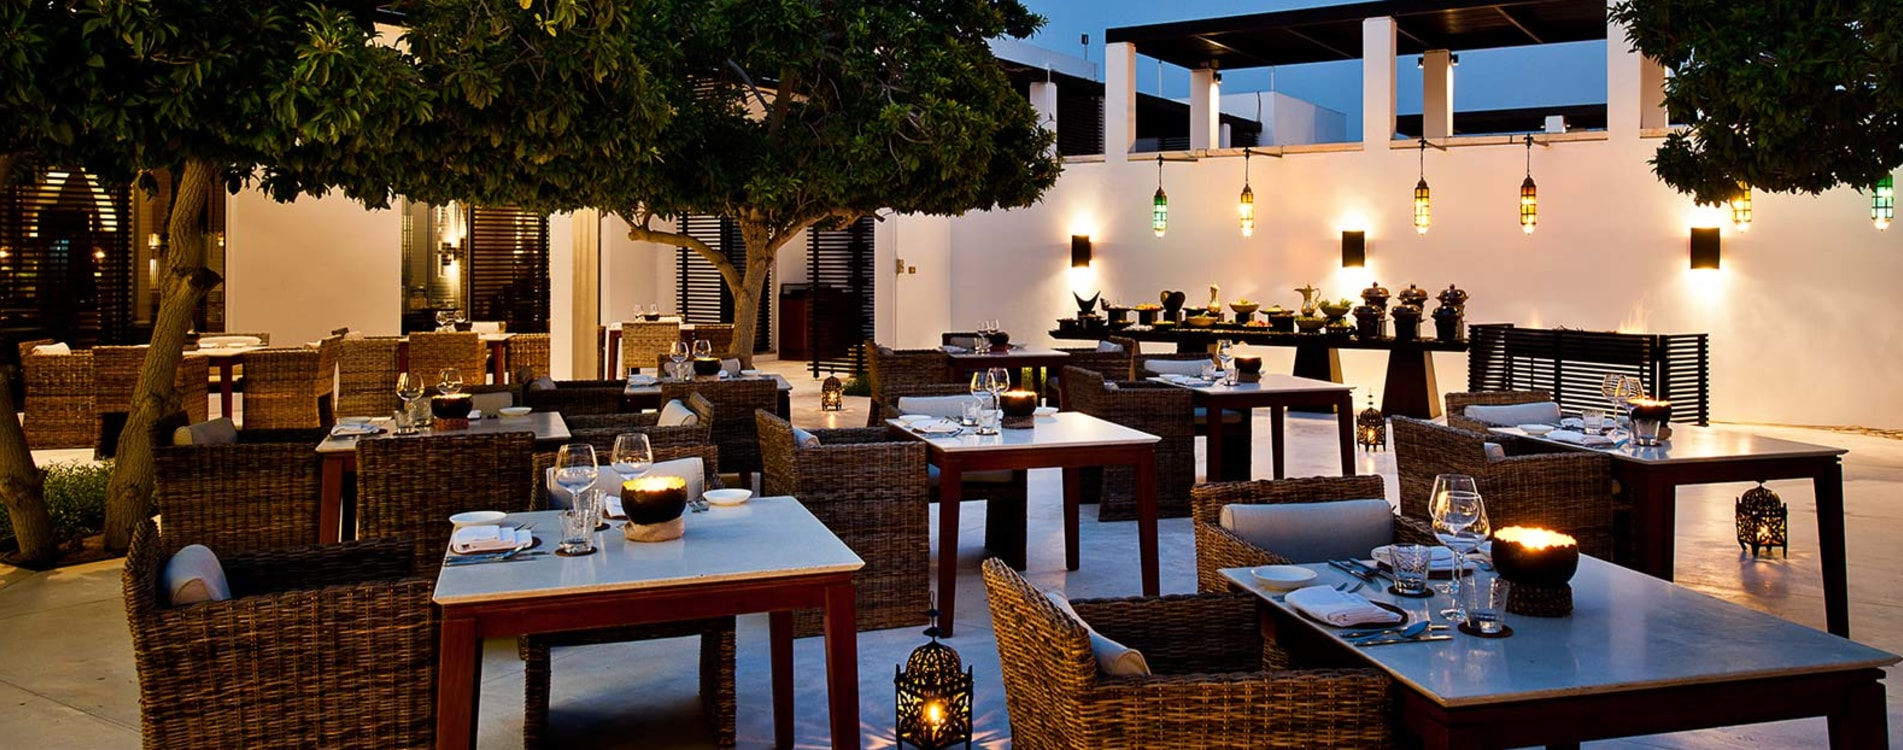 Chedi-Muscat-Dining-Arabian-Courtyard.jpg